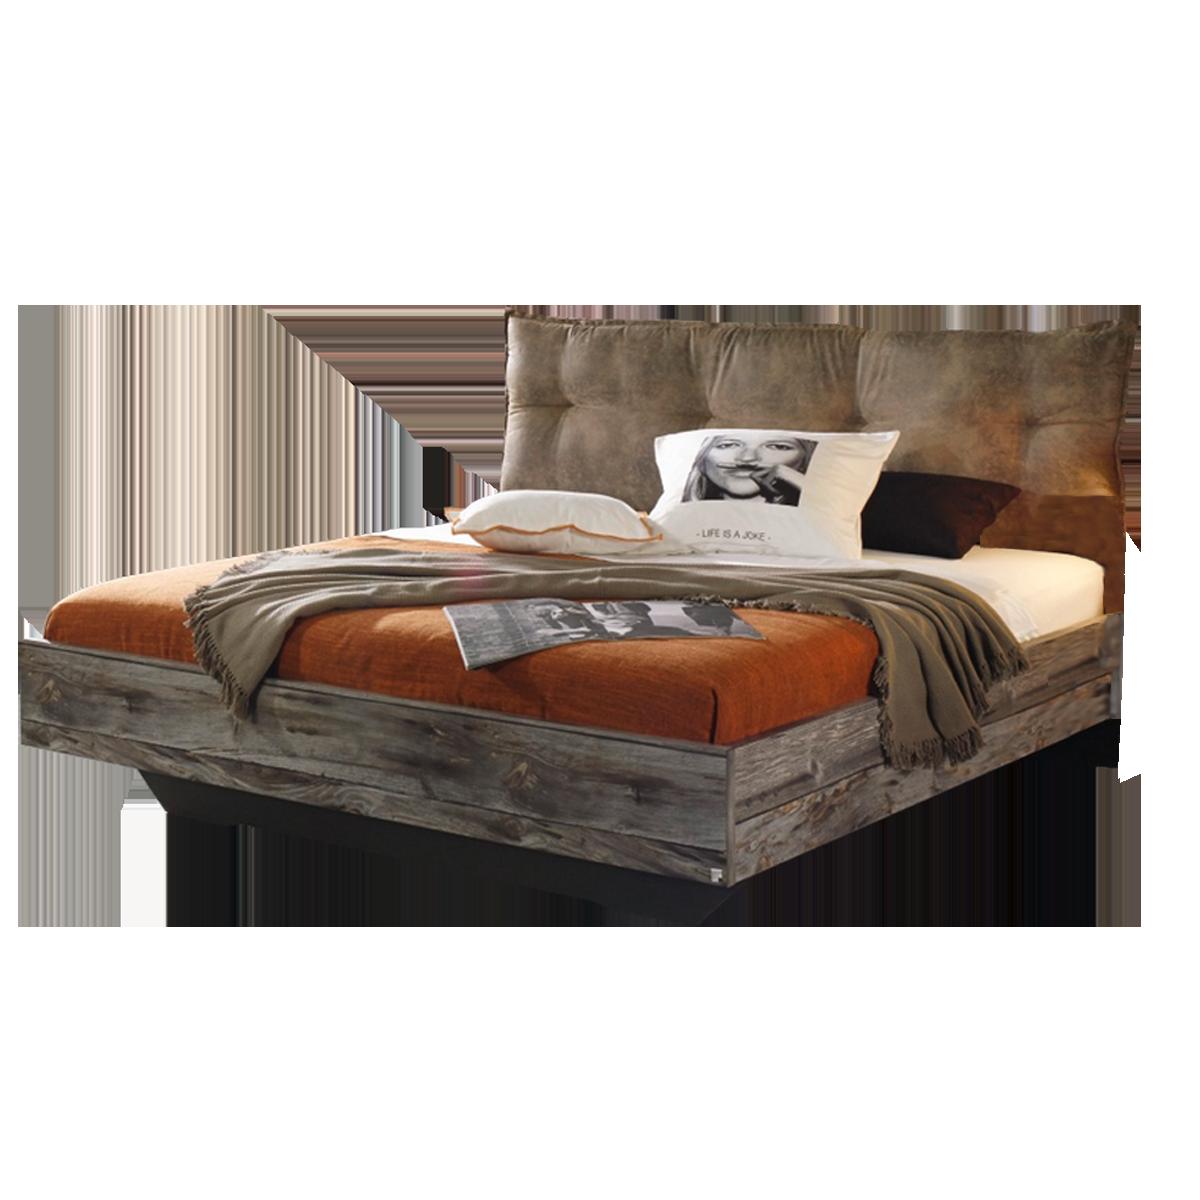 Full Size of Rauch Betten Select Timberstyle Wrkungsvolle Bett Kopfteil In Leder Optik 180x200 Kaufen Möbel Boss Ottoversand Gebrauchtwagen Bad Kreuznach Landhausstil Bett Rauch Betten